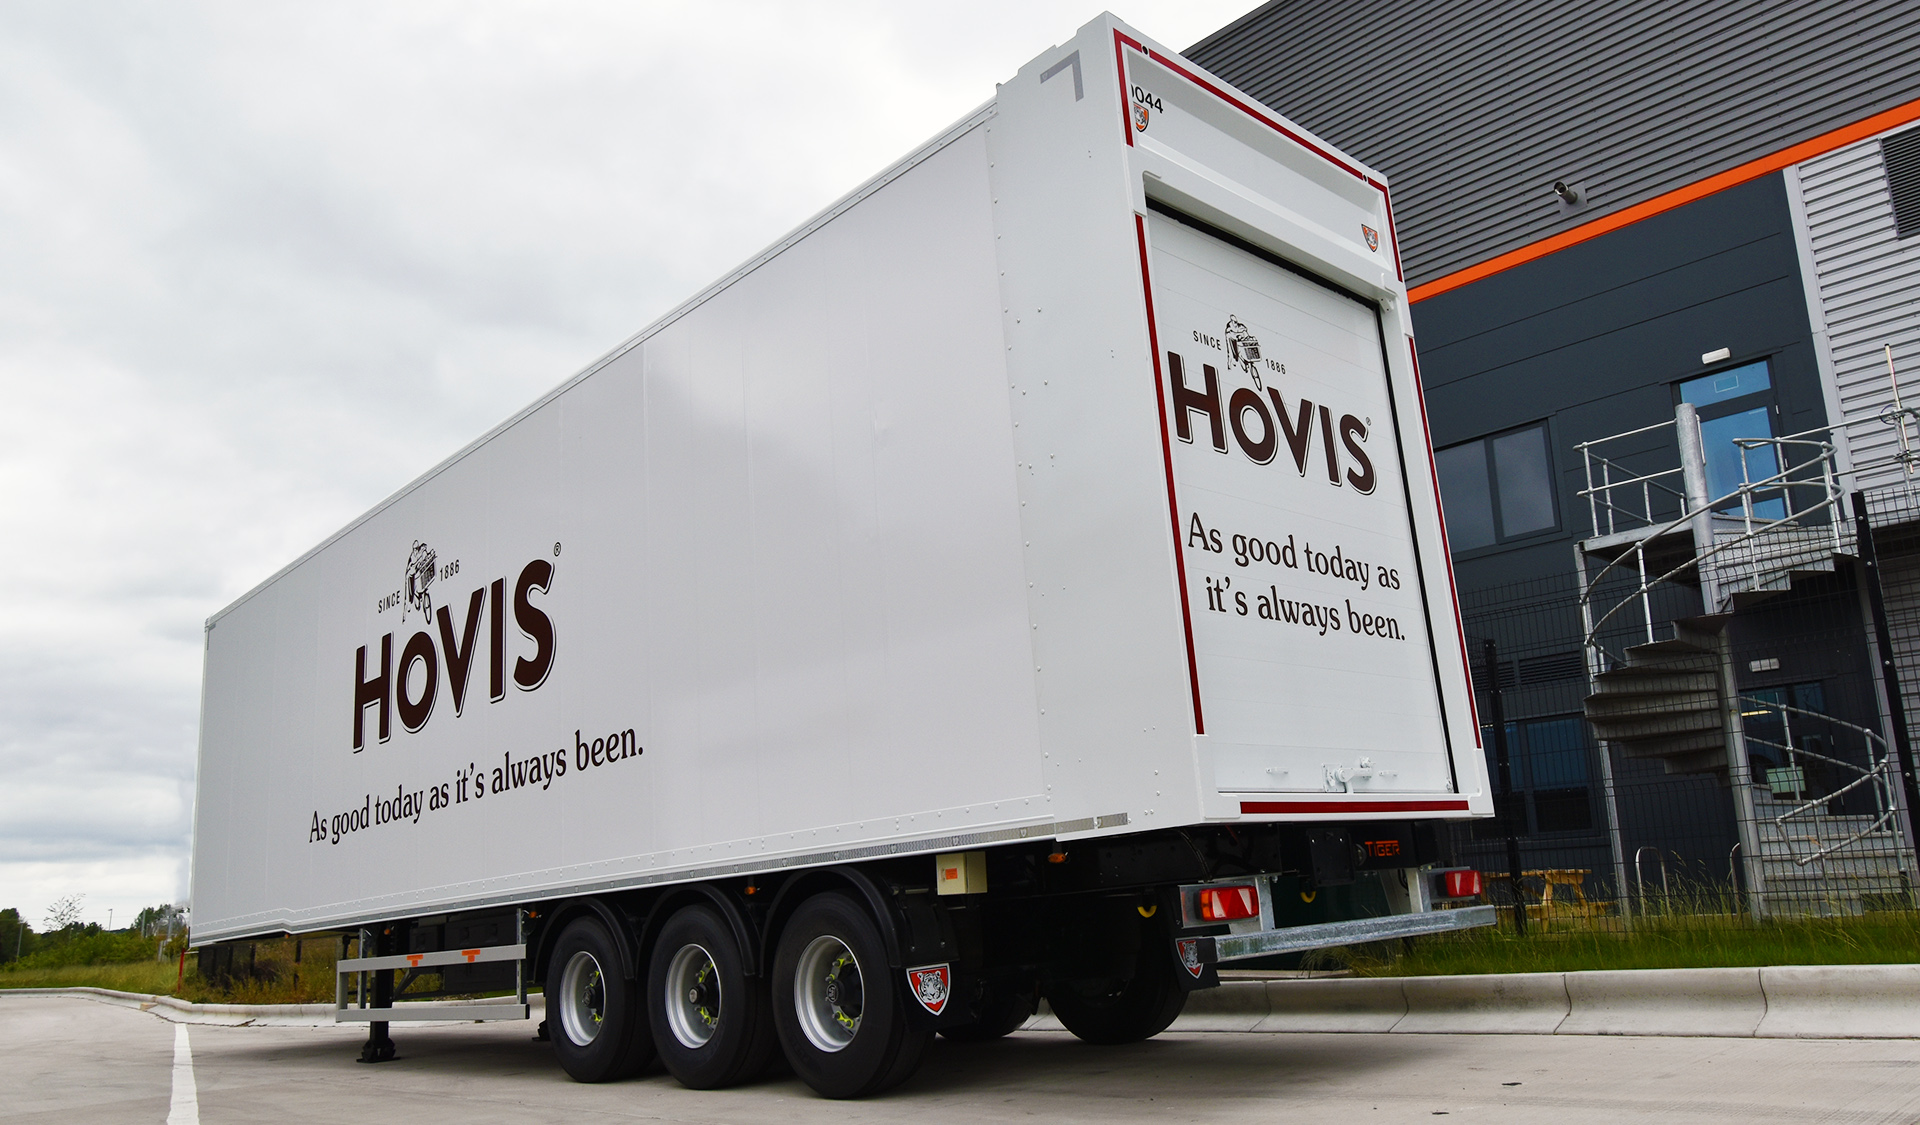 Case study - Hovis baker innovative efficient moving double deck bread basket - internal roof